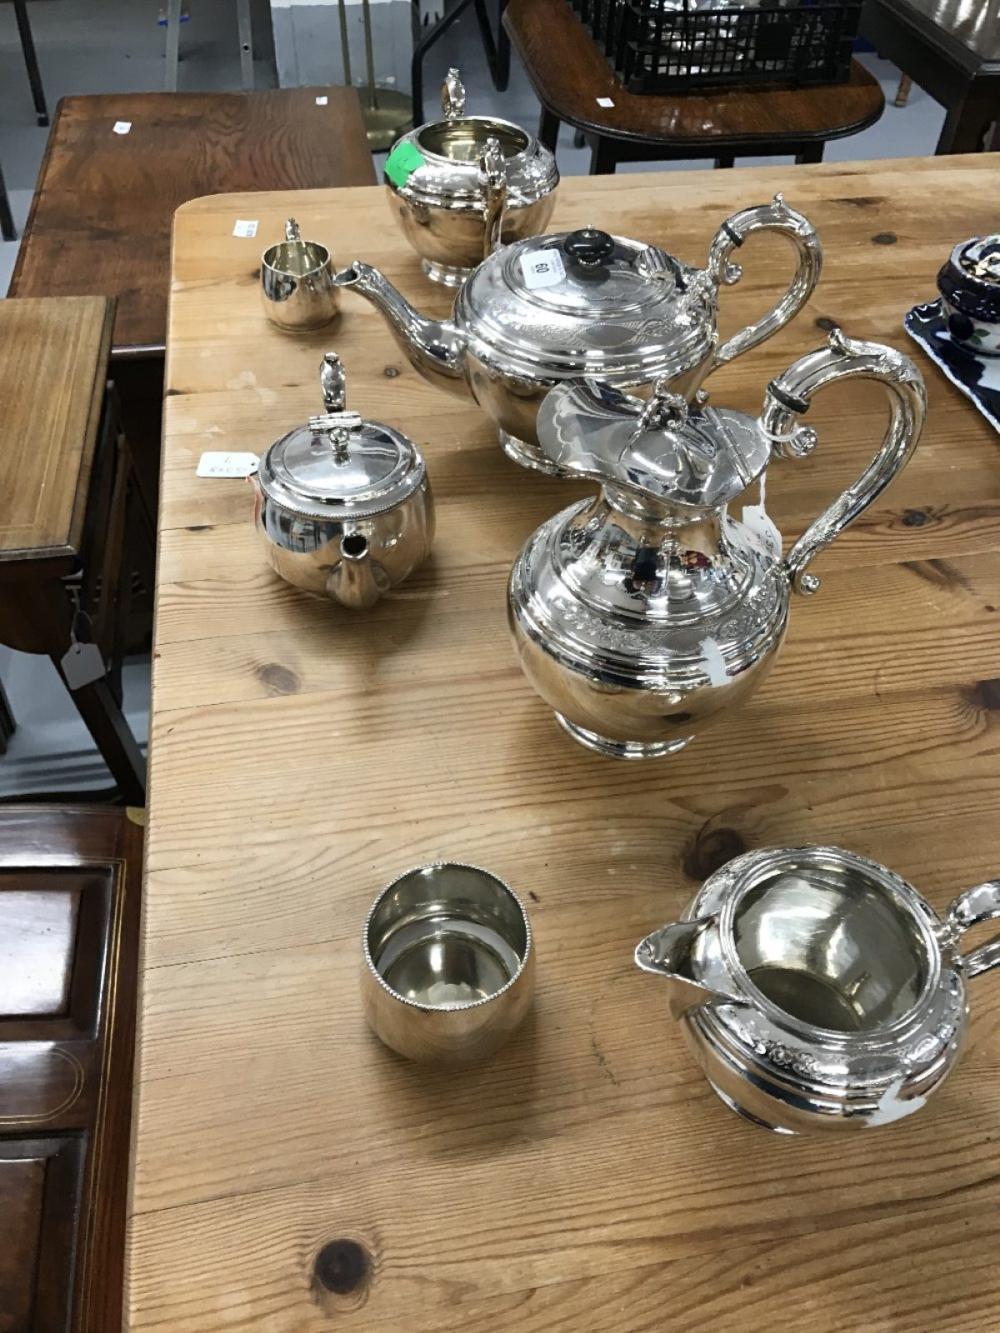 Platedware: Sheffield Britannia metal tea service of teapot, hot water jug, milk jug, and sugar bowl